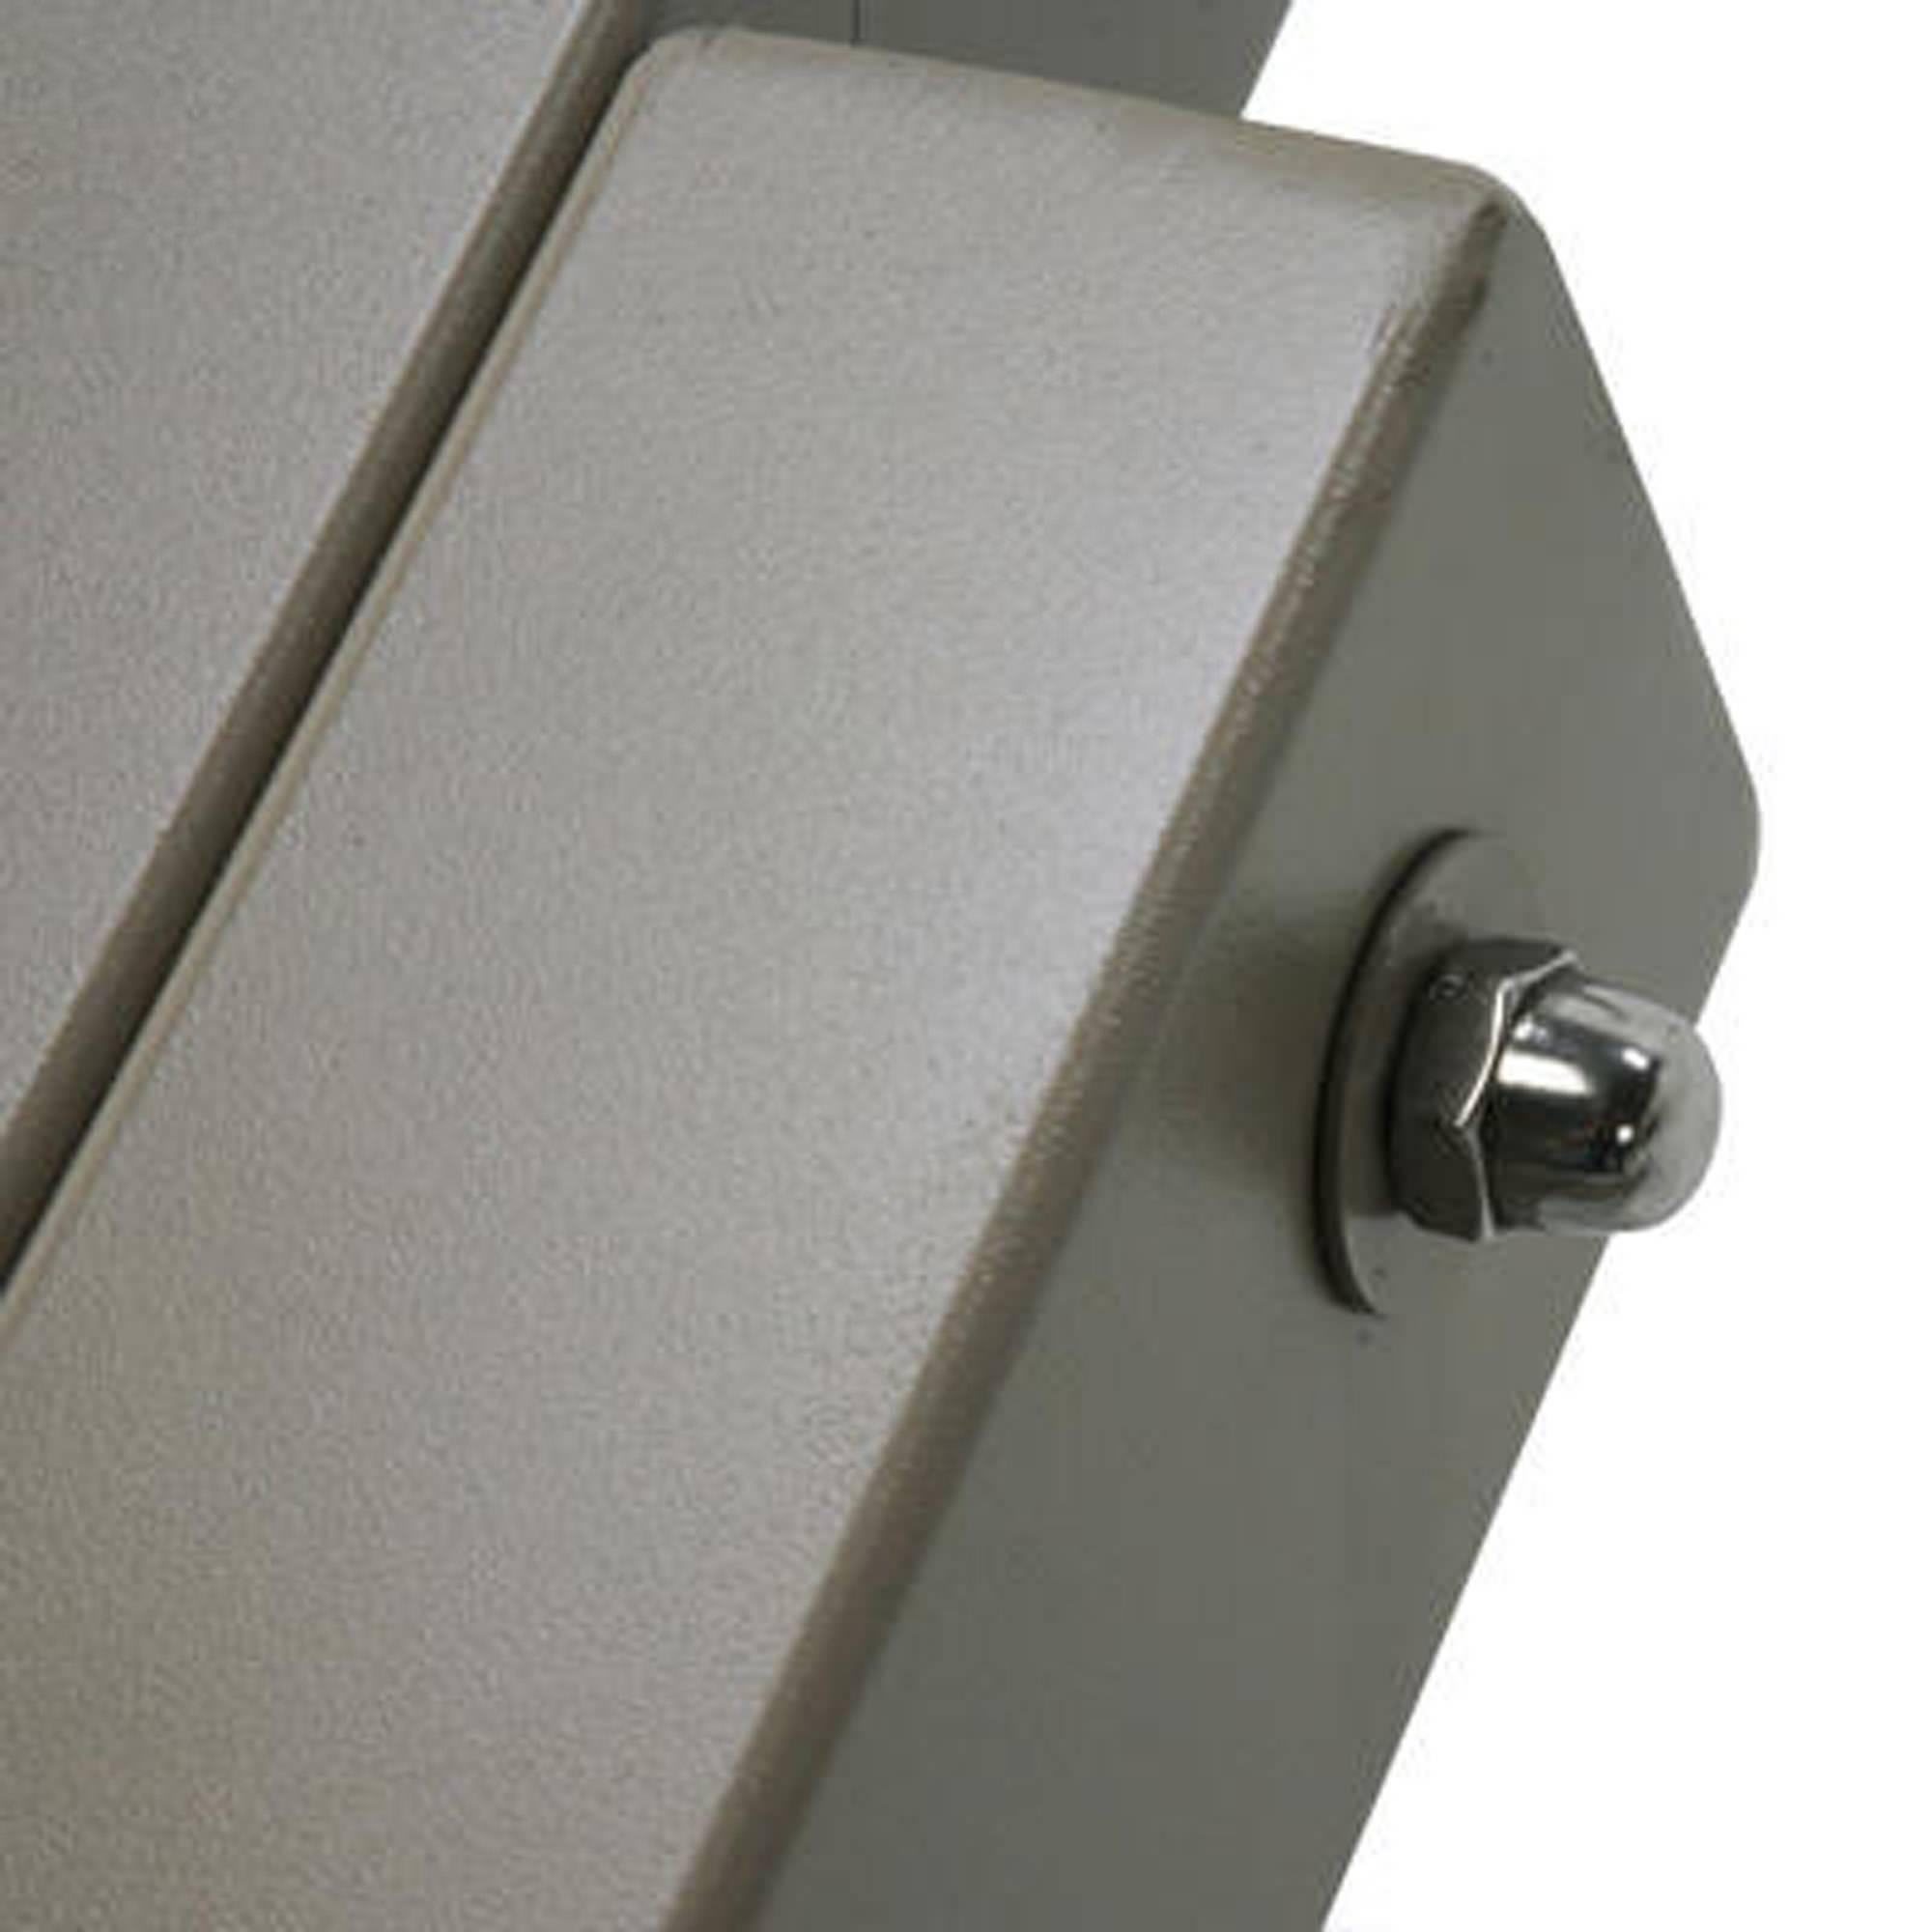 Hammock Stand Hardware Aluminum Small Hammock Stand